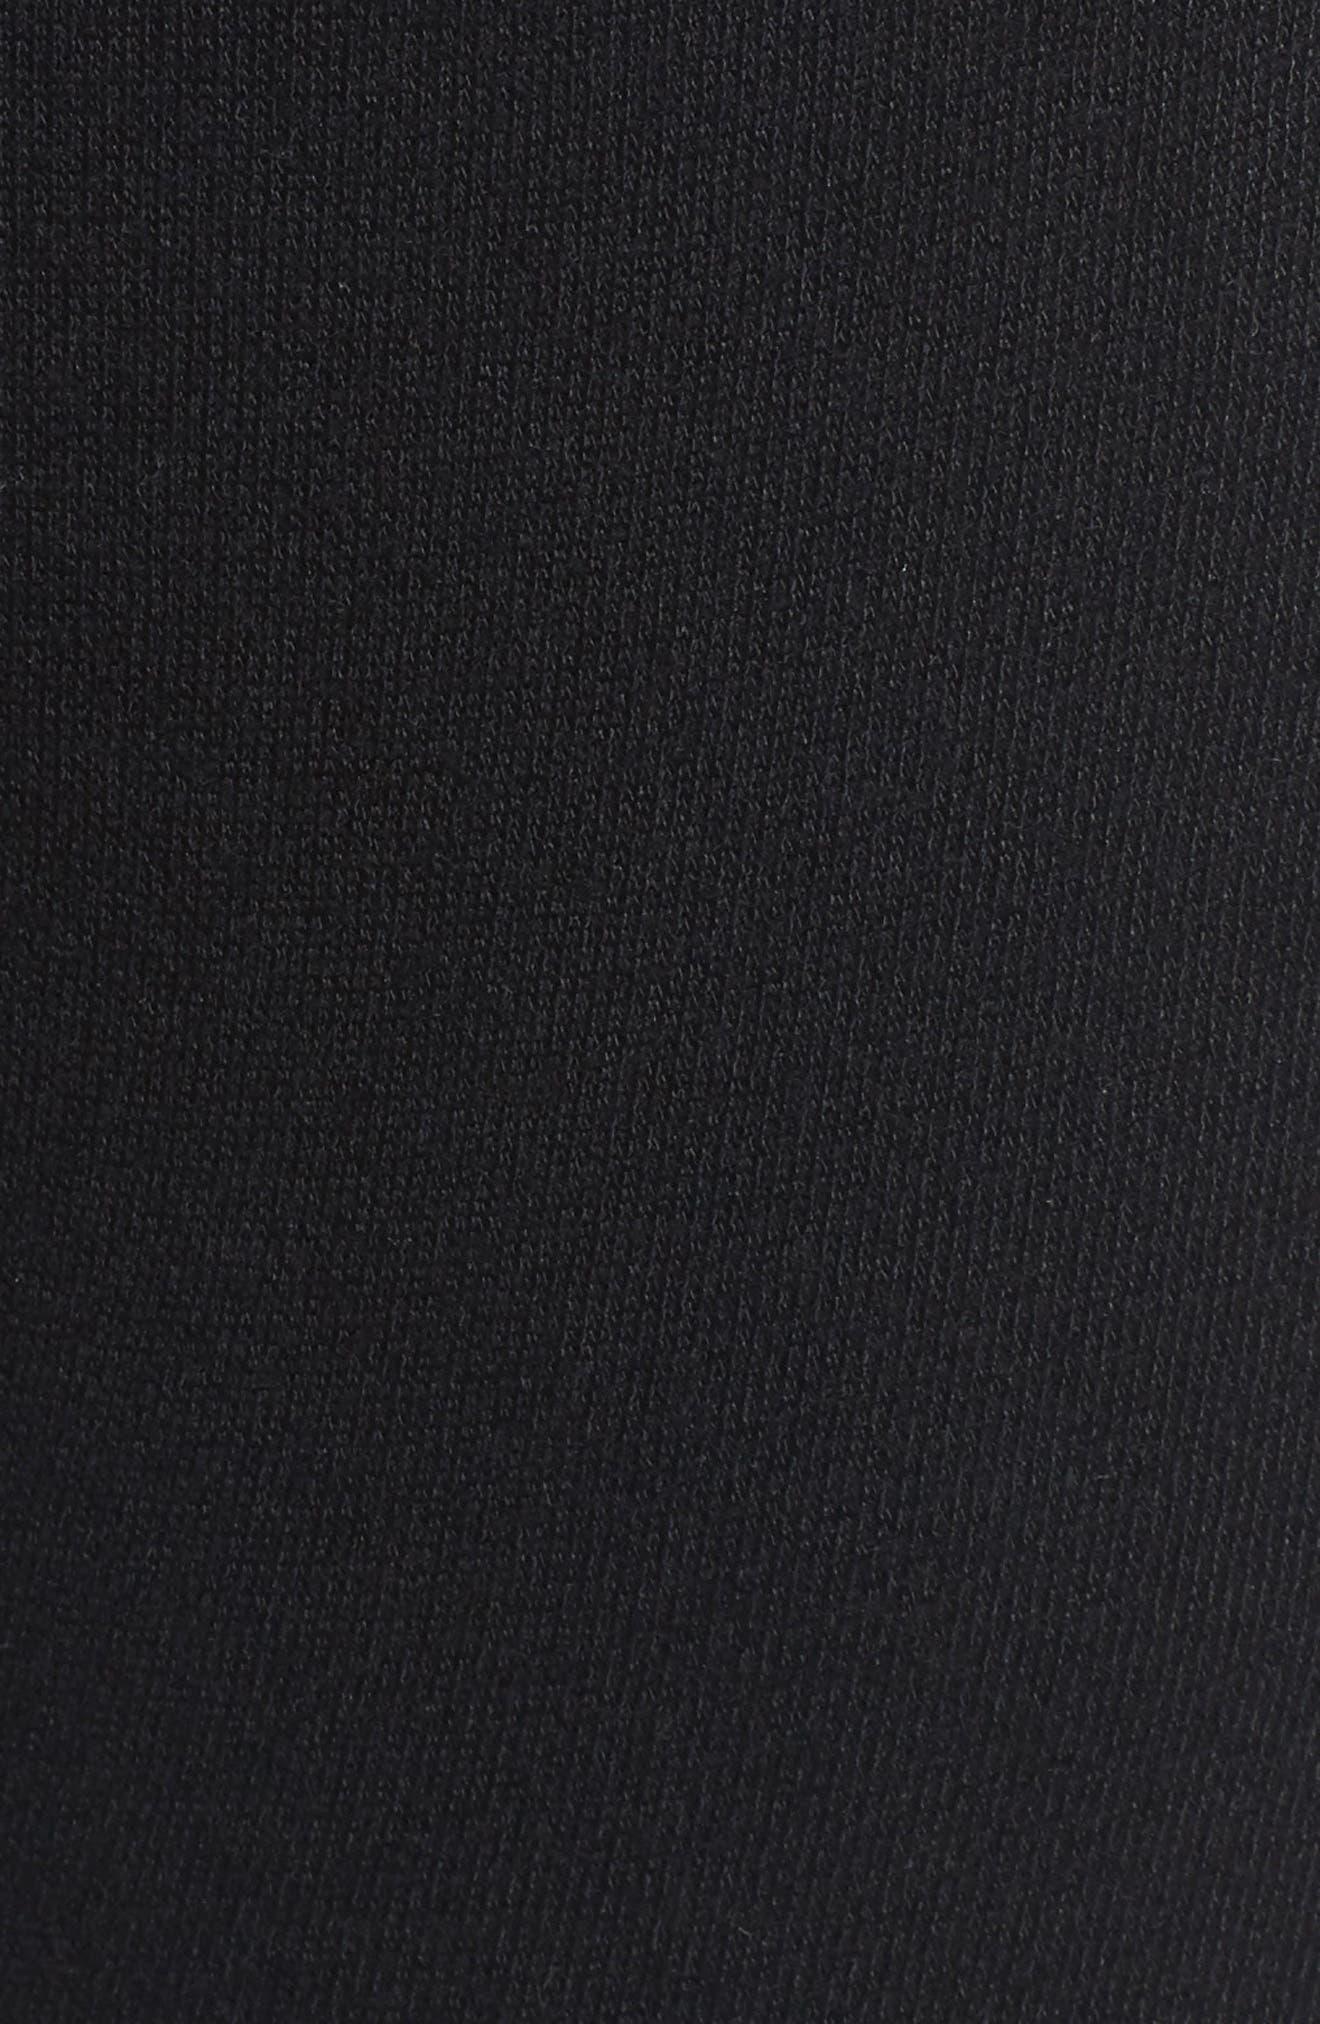 Gravity Sweatpants,                             Alternate thumbnail 6, color,                             Black Cat